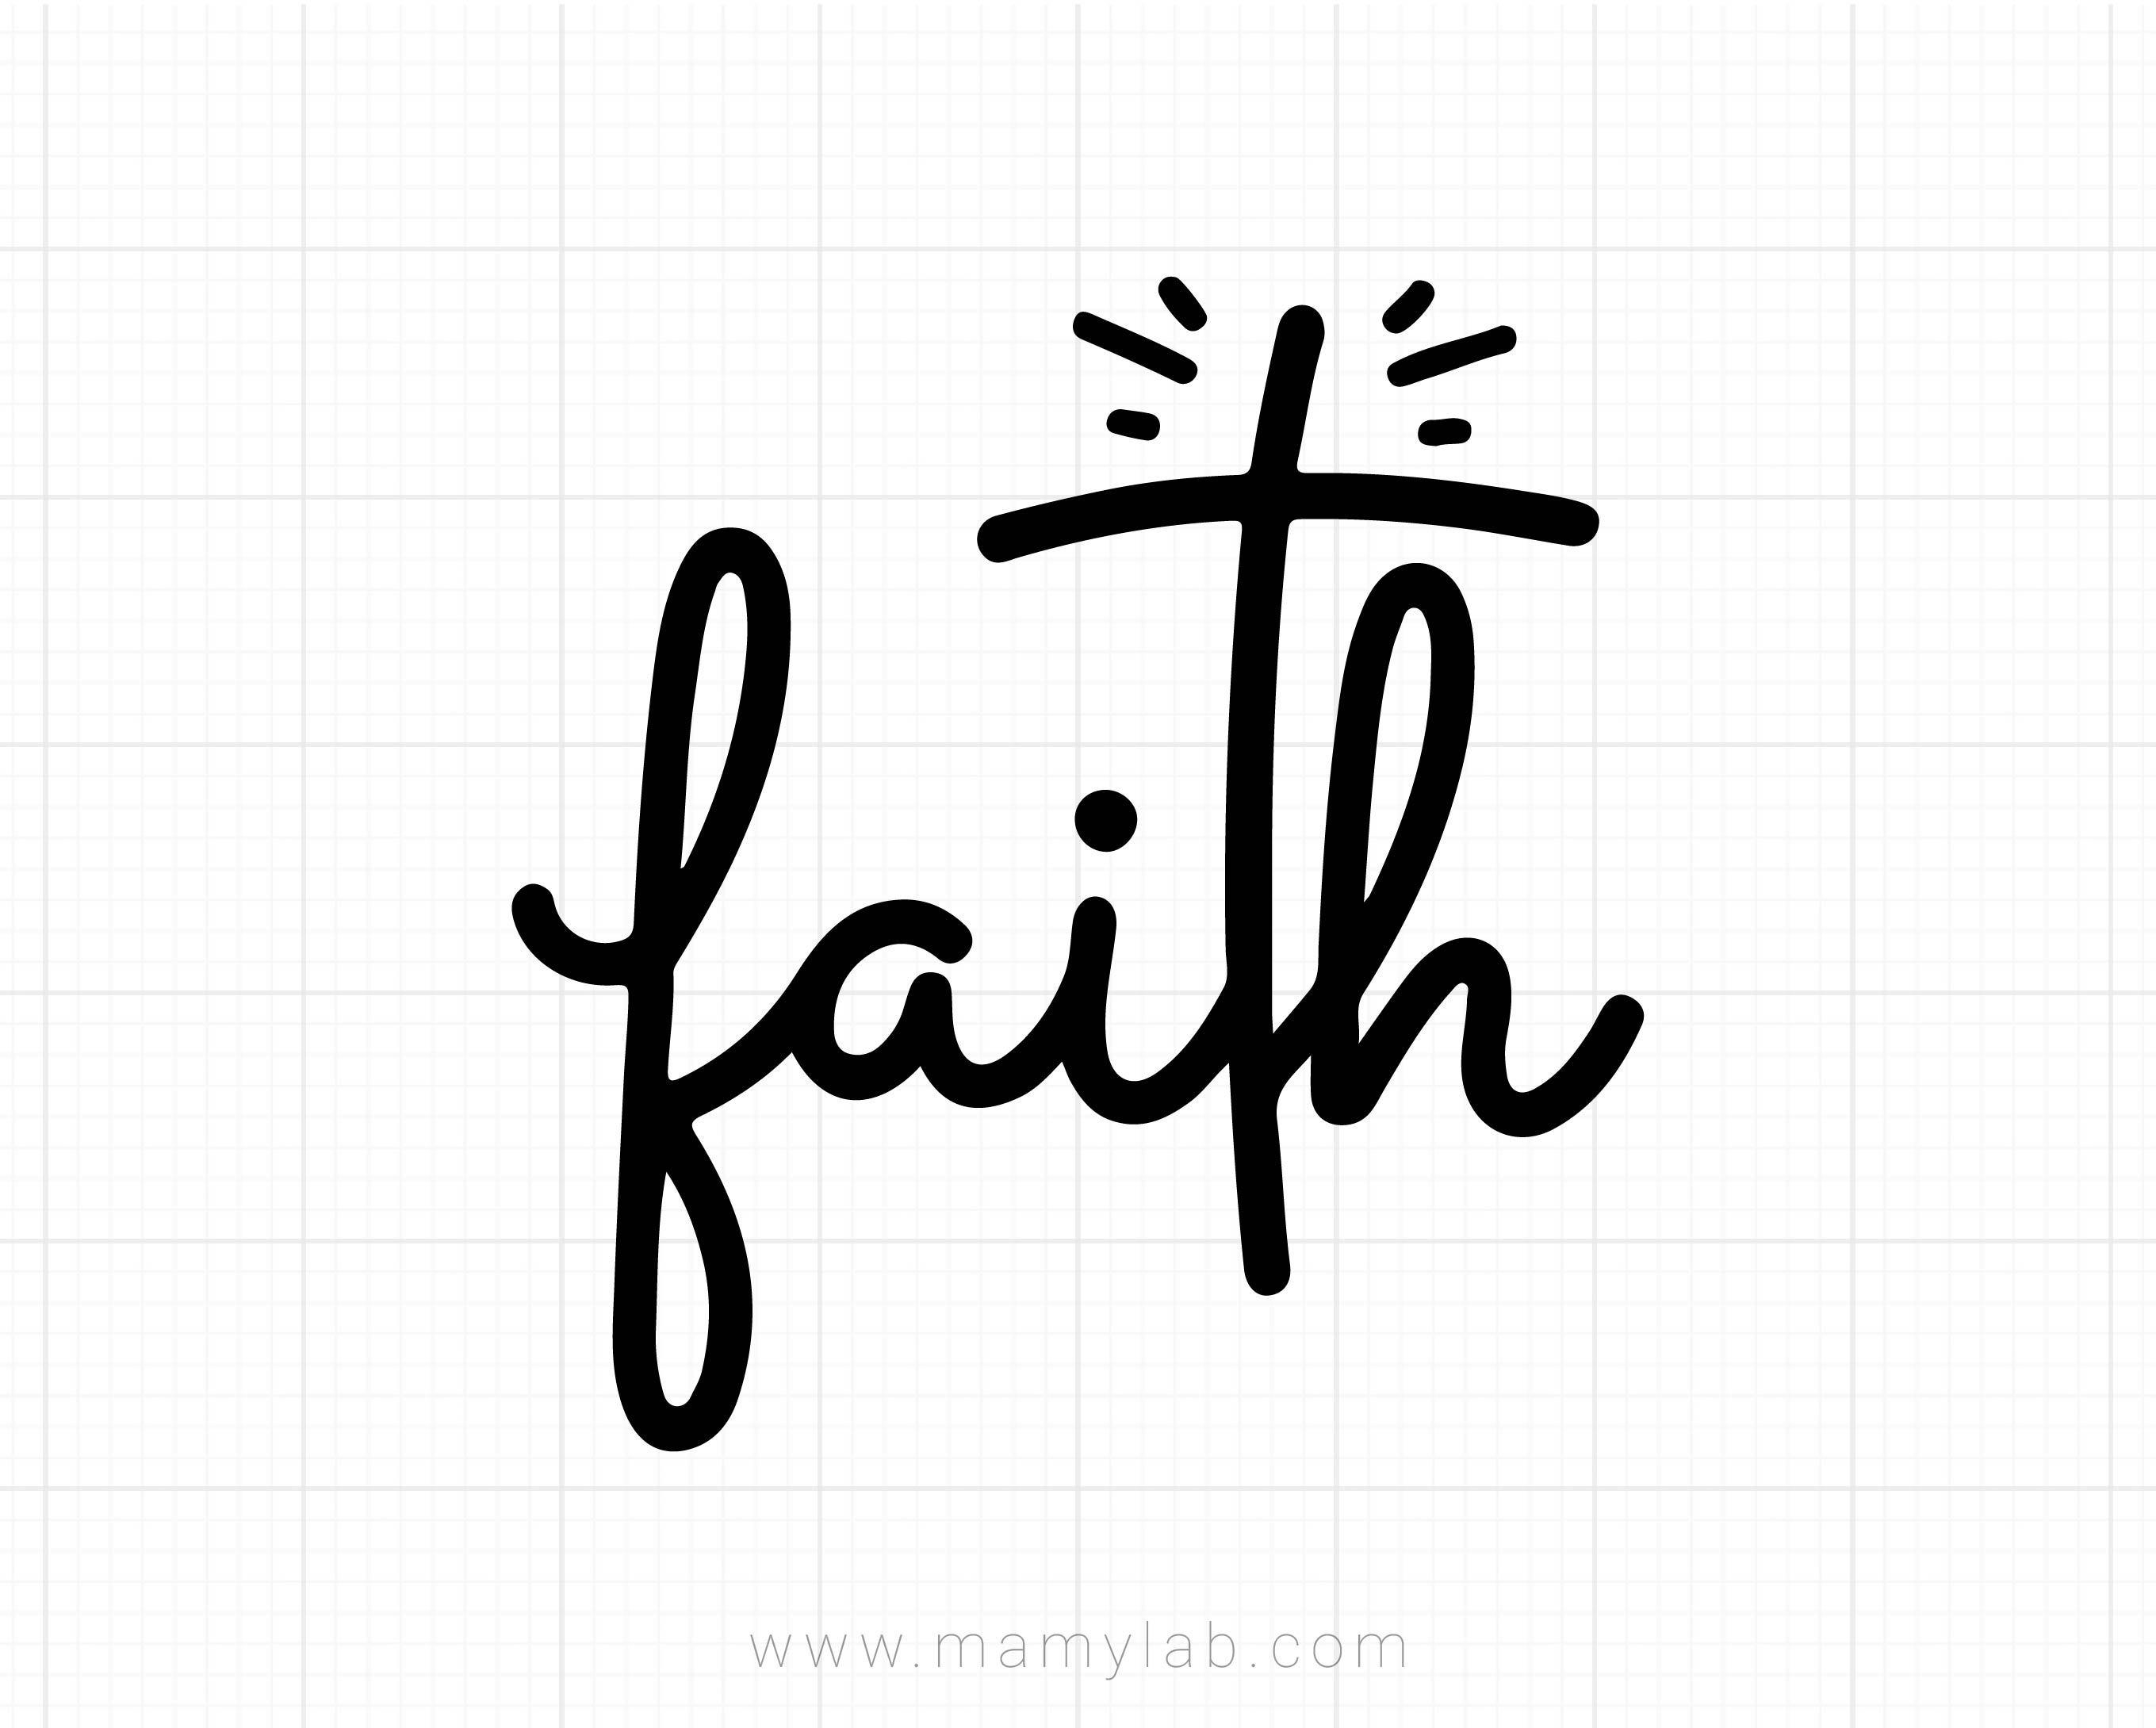 Faith Svg, Faith Cross Svg, Jesus Cross Svg Dxf Png, Christ Clipart,  Believe Svg, Christian Shirt Design, Silhouette, Cricut, Cut Files.